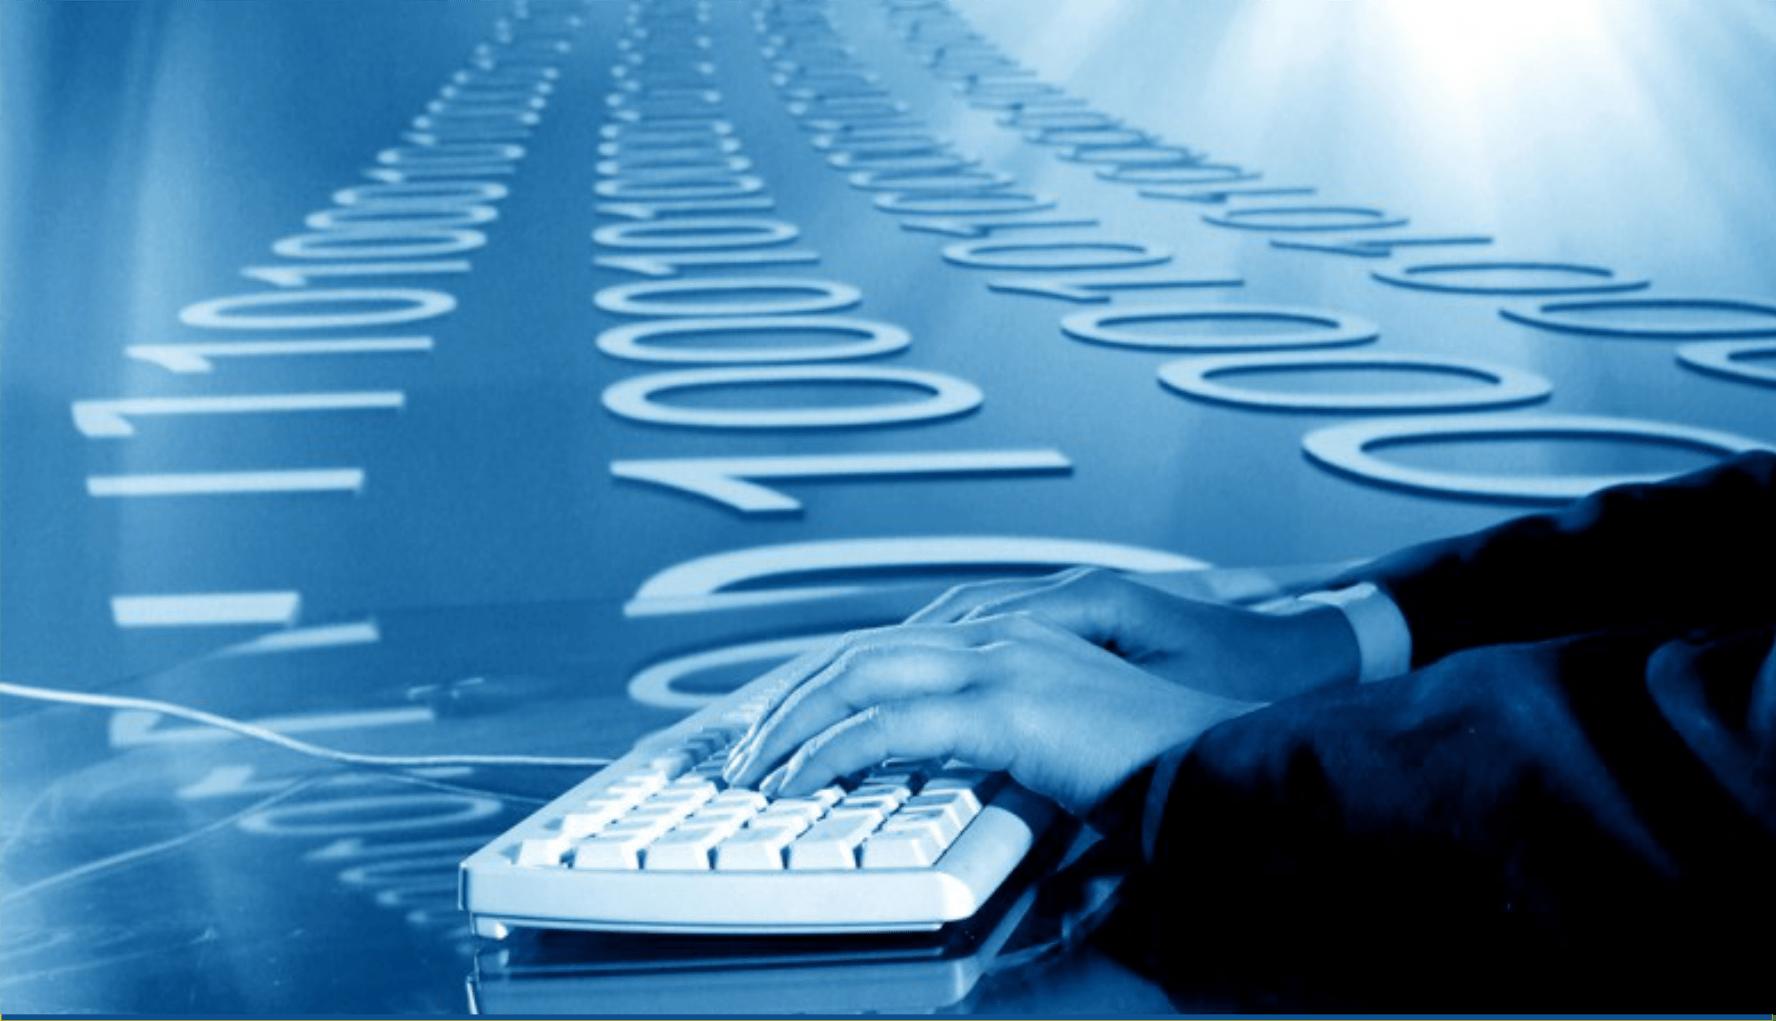 A TECNOLOGIA E O SURGIMENTO DE NOVAS PROVAS ILÍCITAS NO PROCESSO PENAL BRASILEIRO.